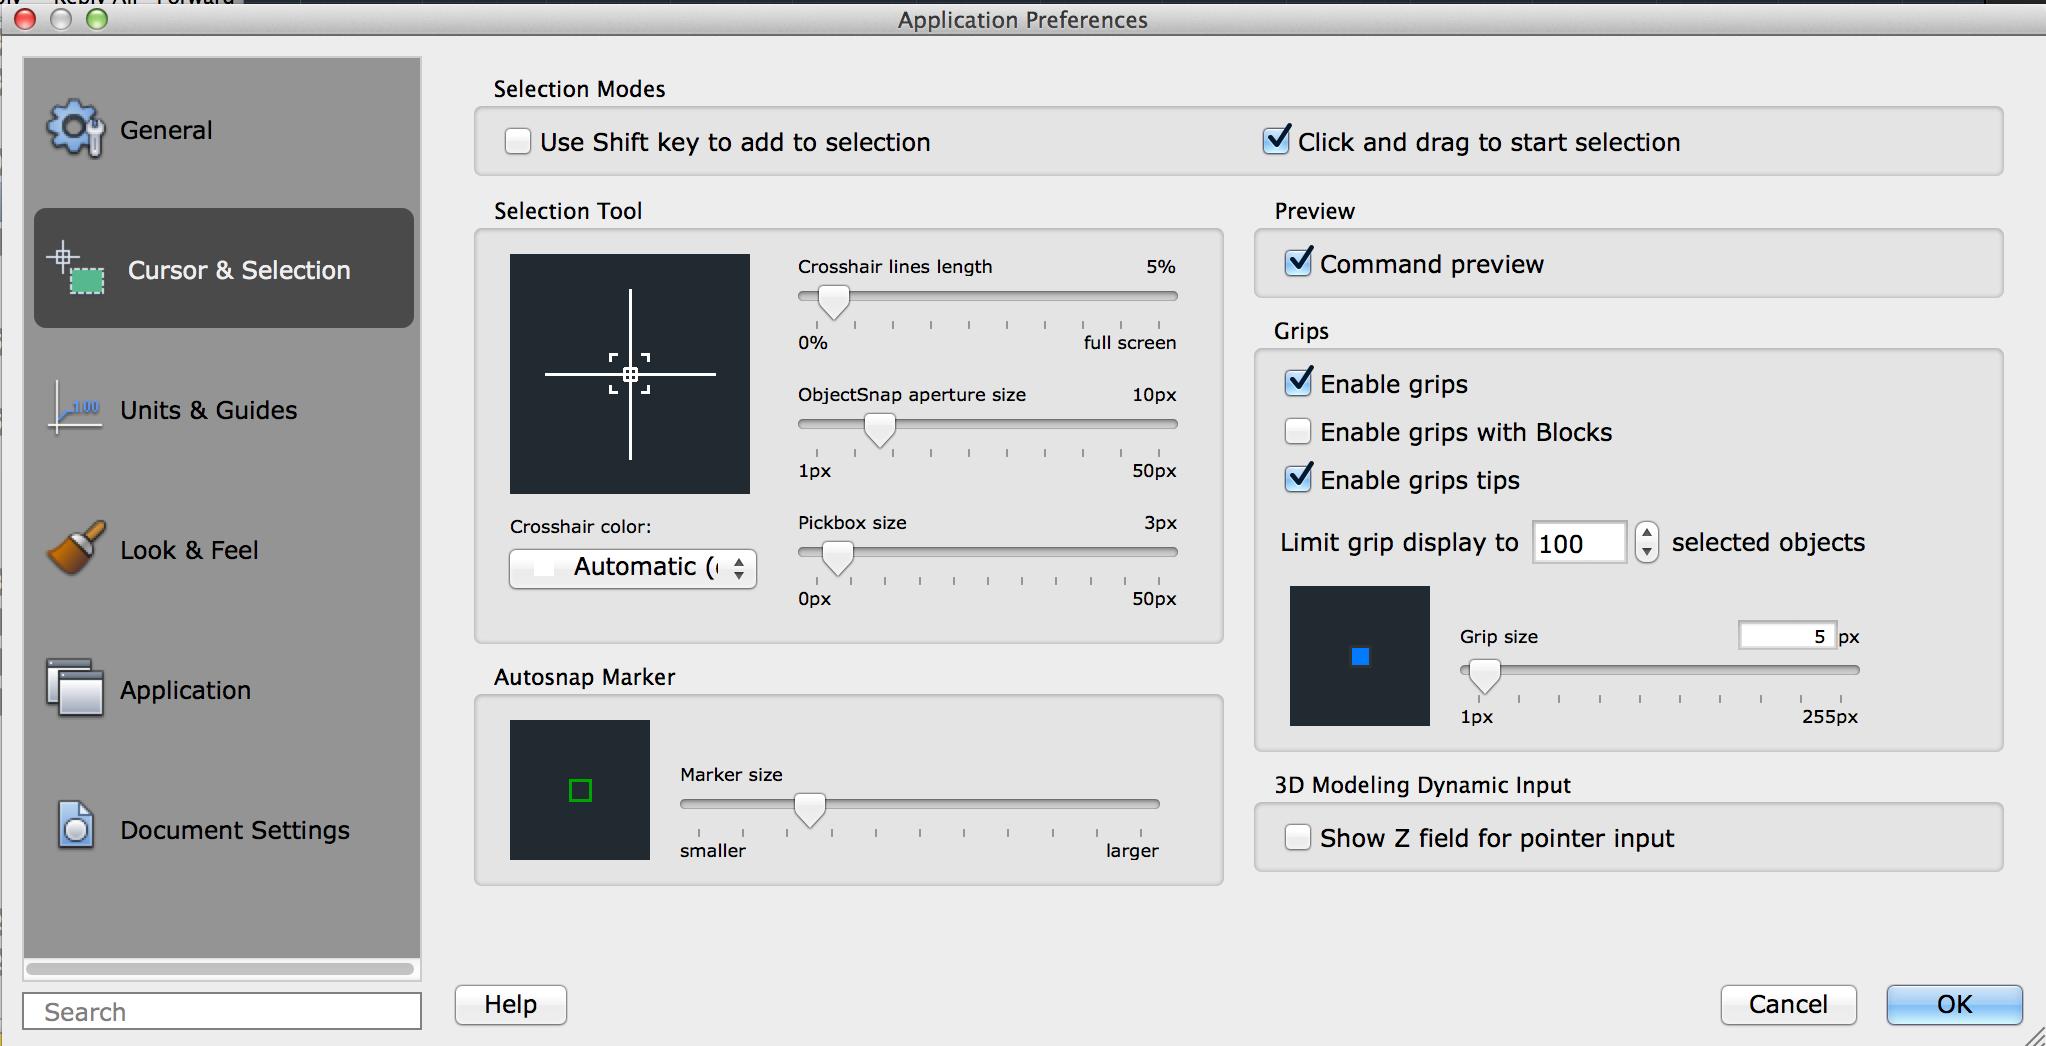 Cursor & Selection Tab (Application Preferences Dialog Box